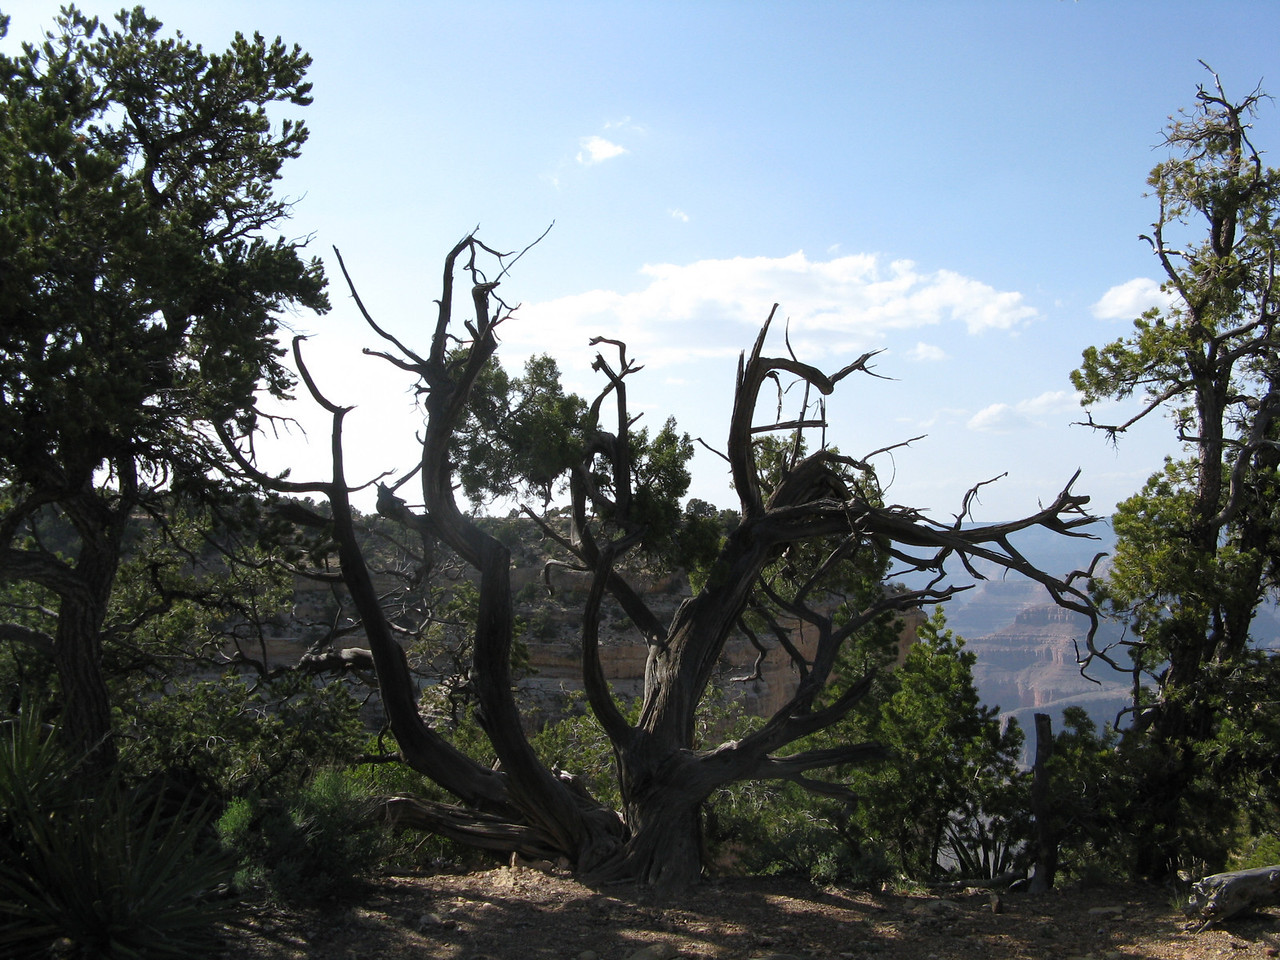 An interesting tree at an overlook.